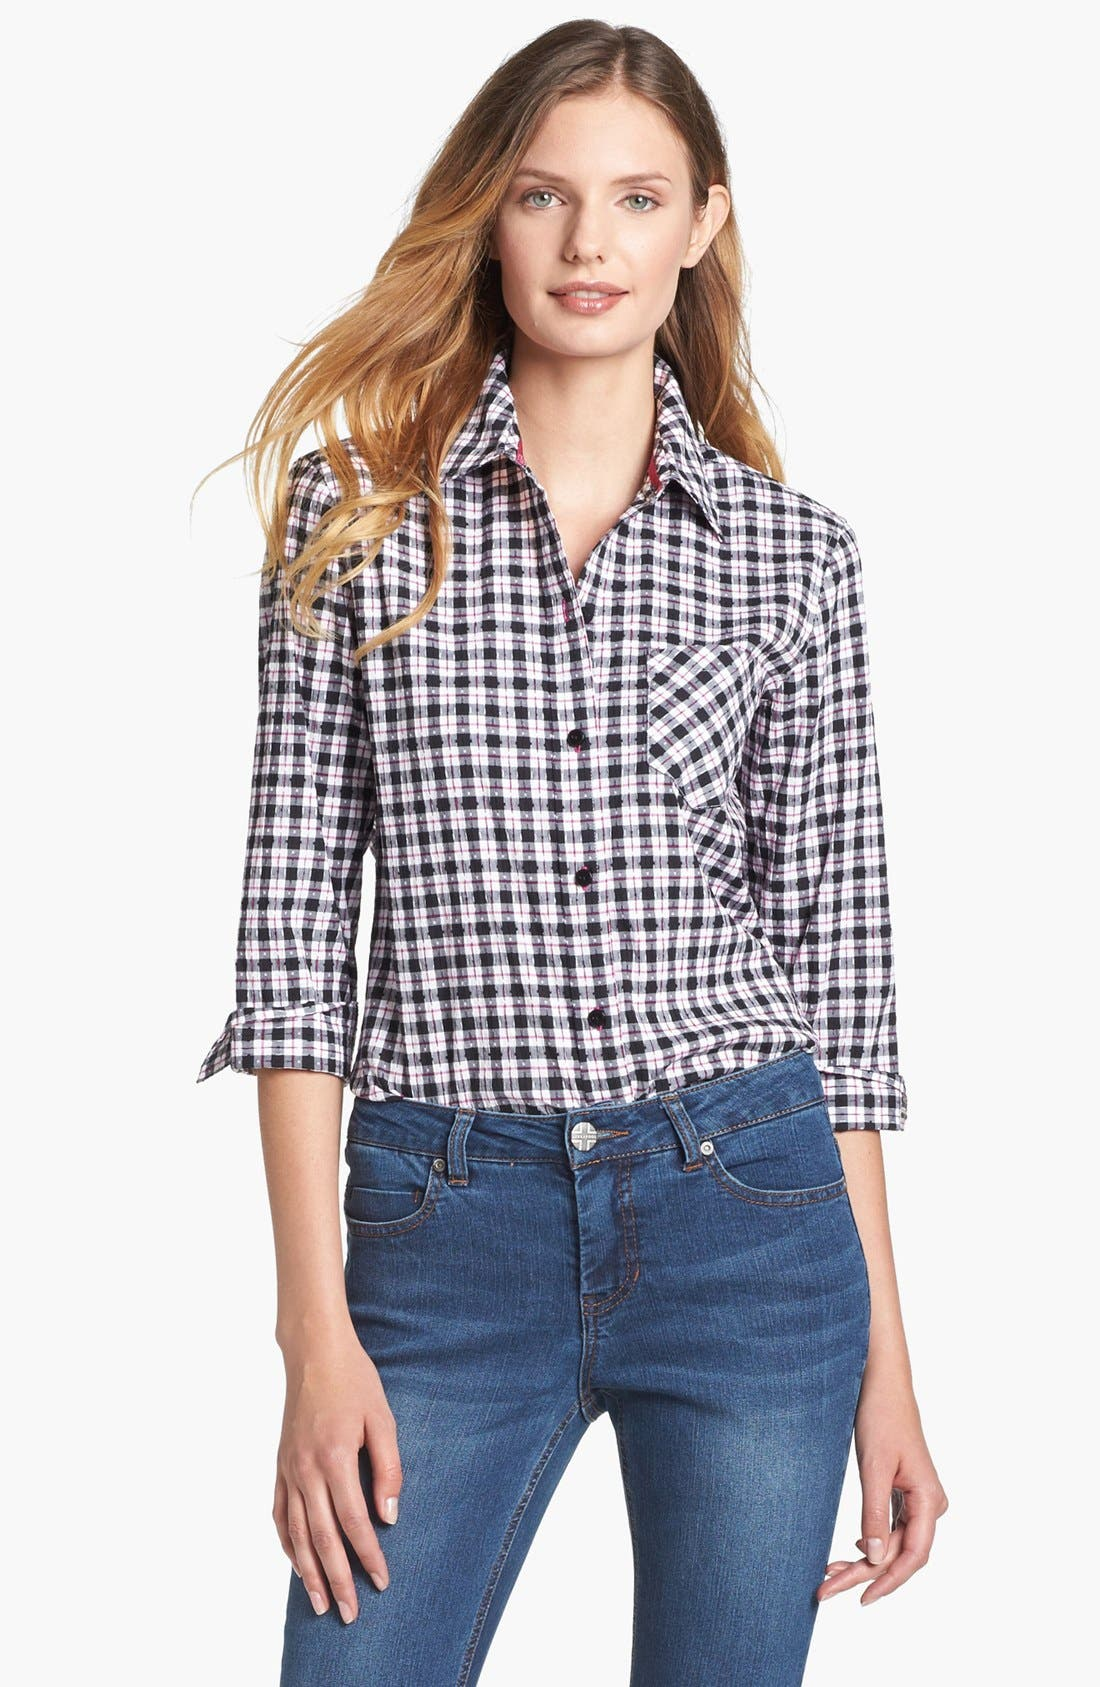 Main Image - Foxcroft Check Stretch Cotton Shirt